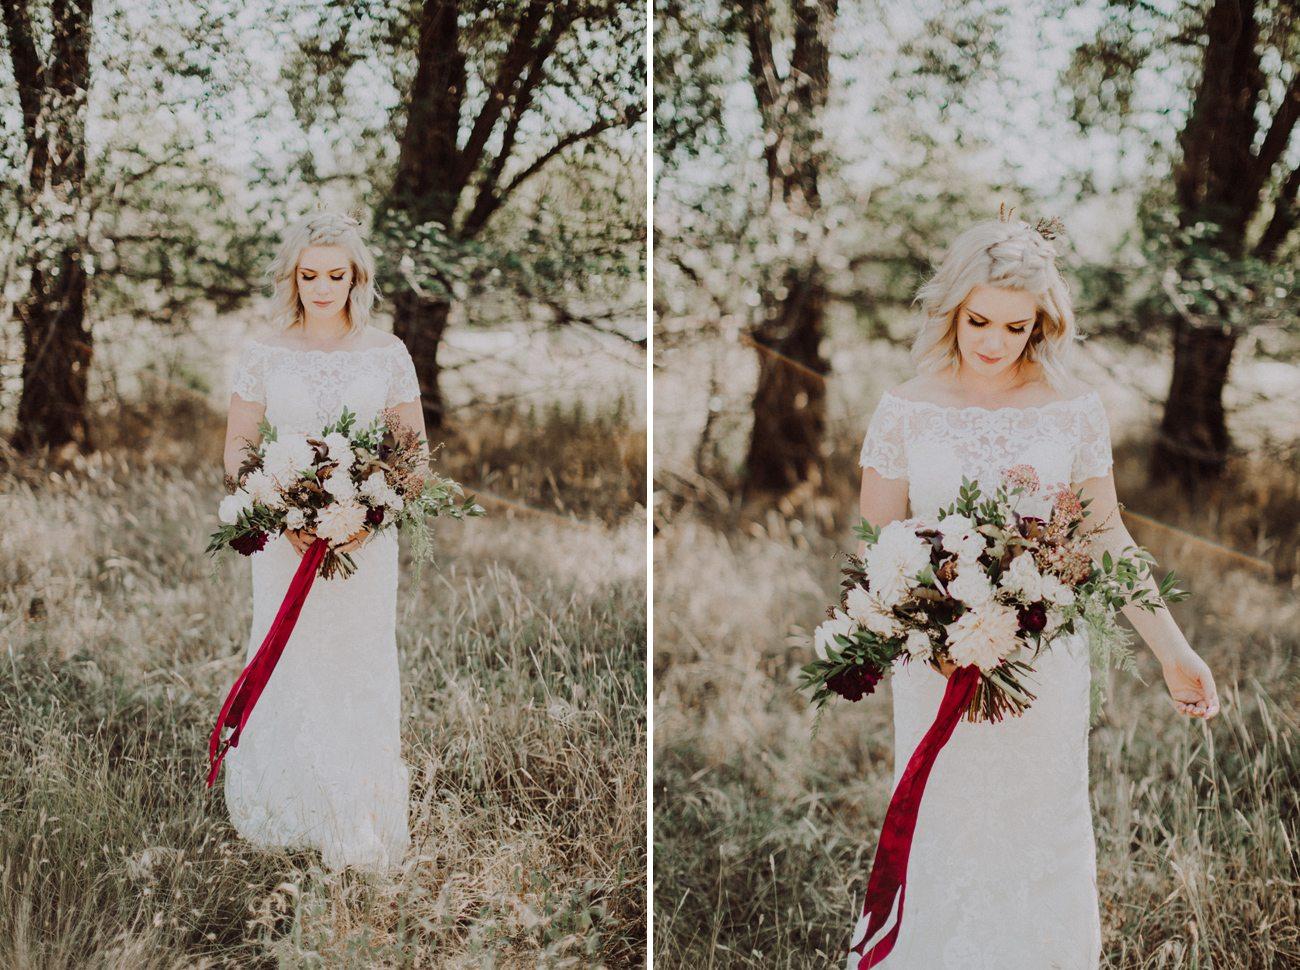 244-vernon-wedding-photographer